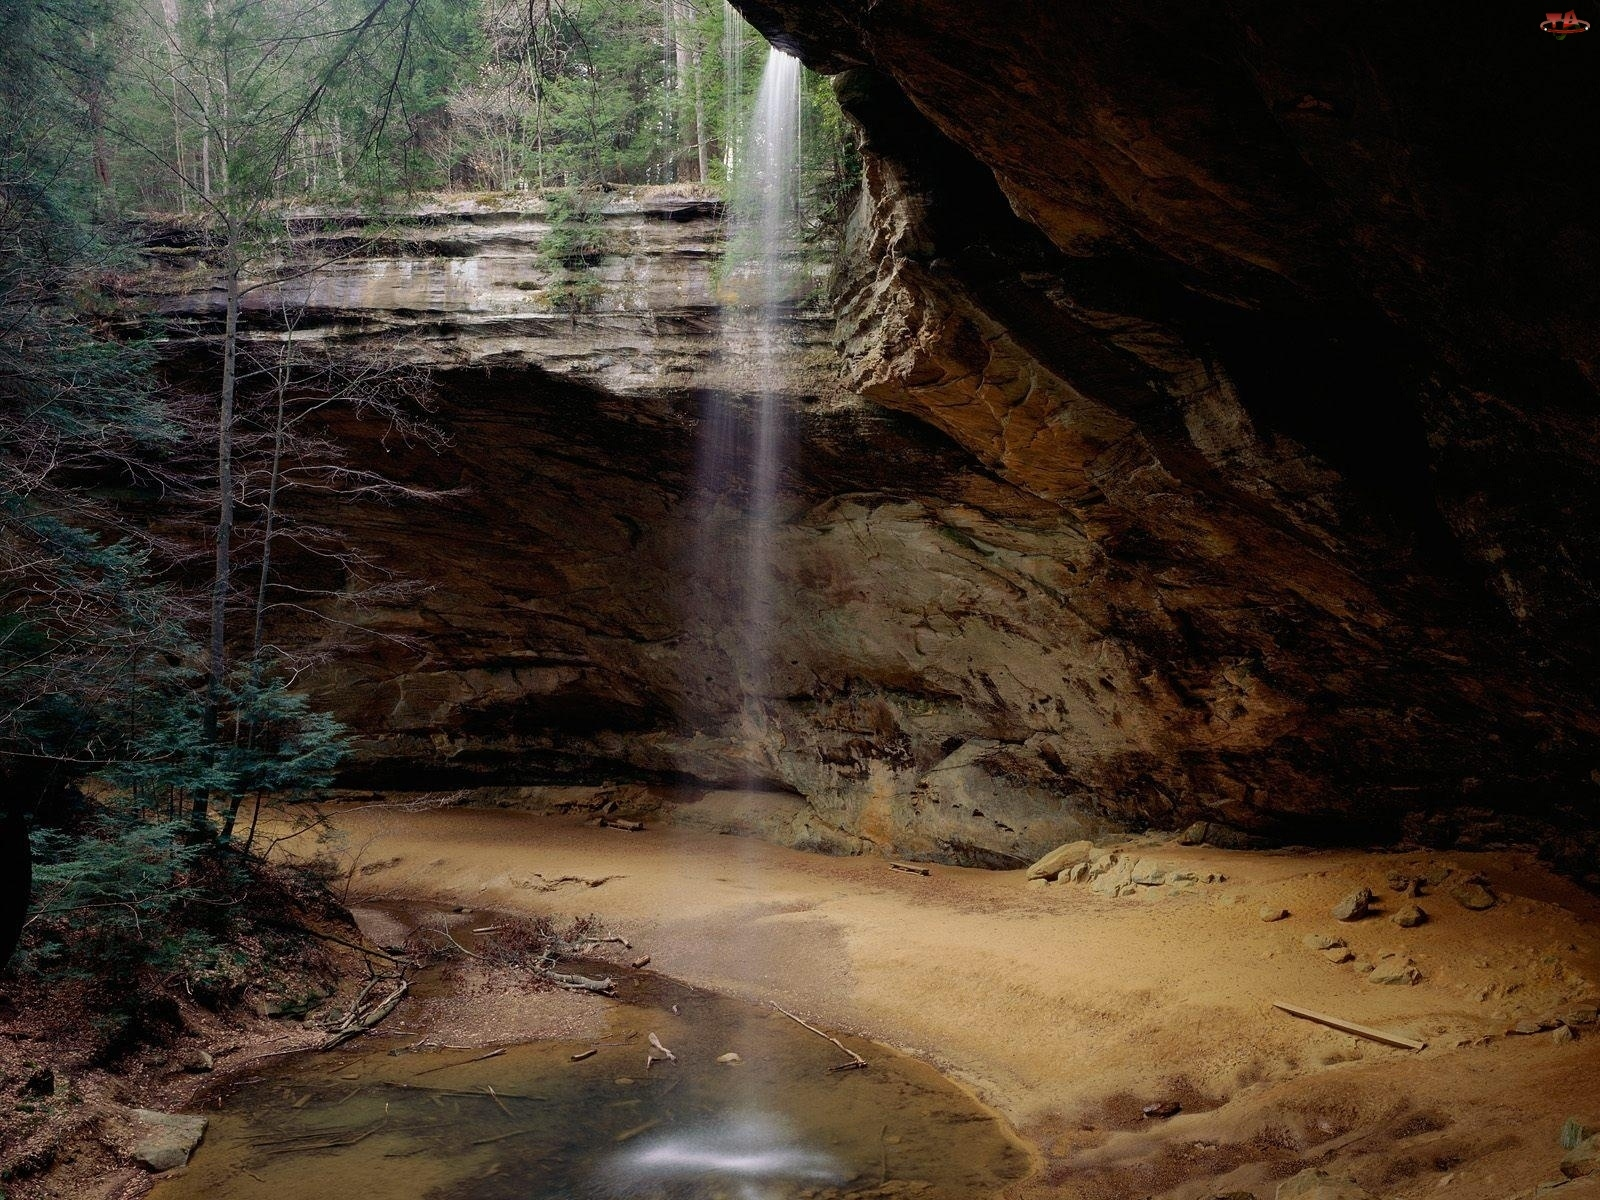 Jaskinia, Woda